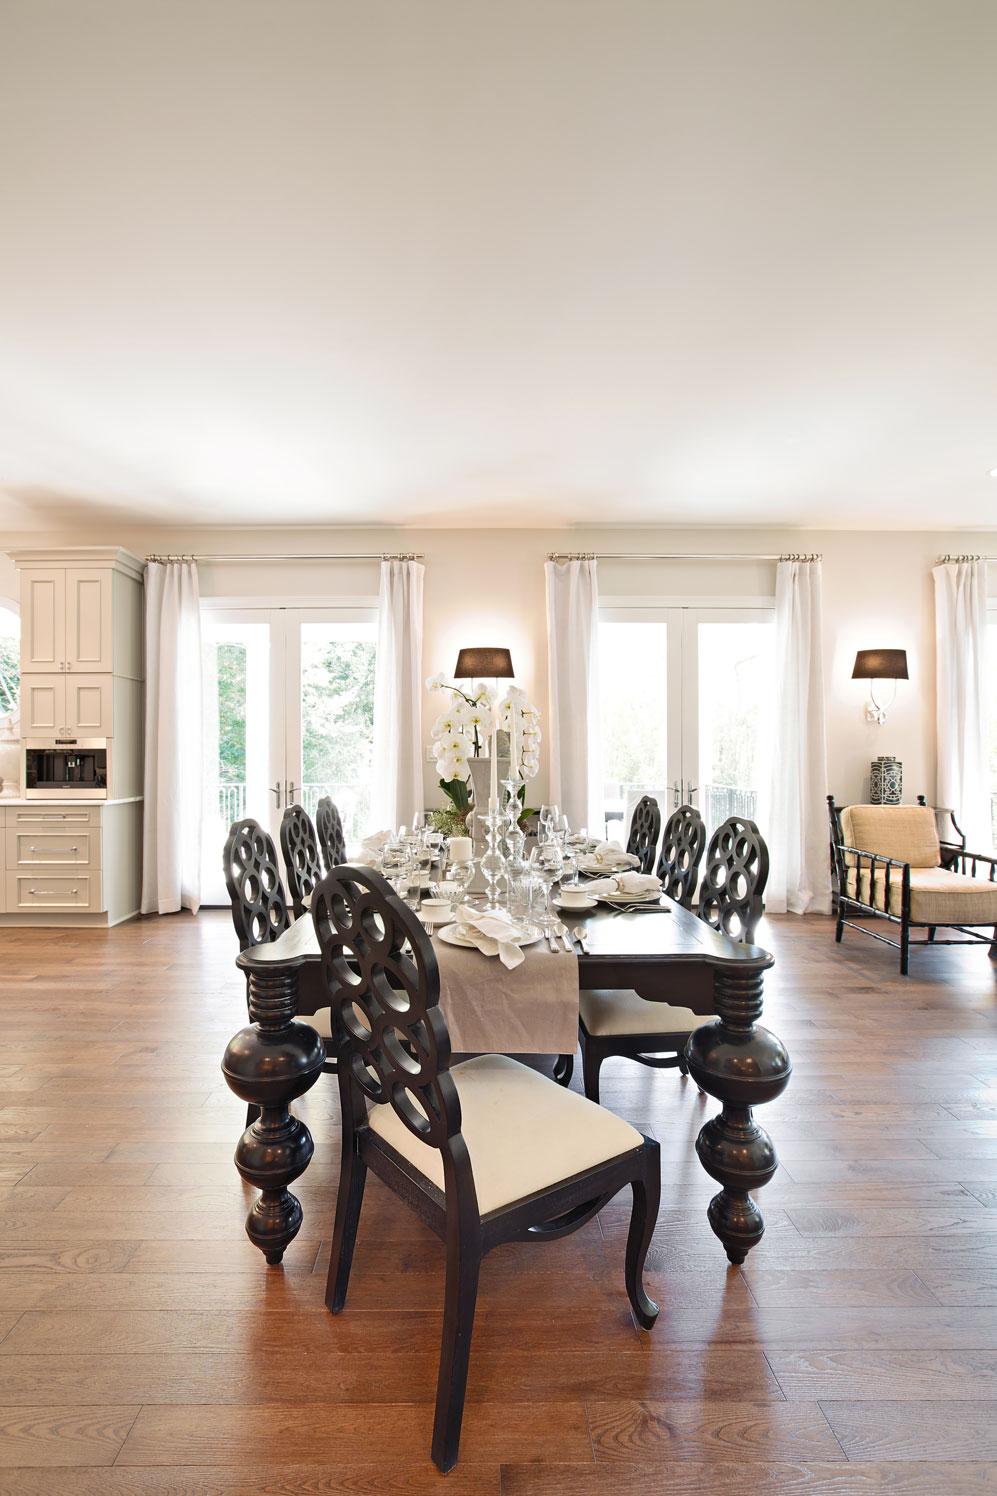 Courtney Casteel, Interior Design Dining Room